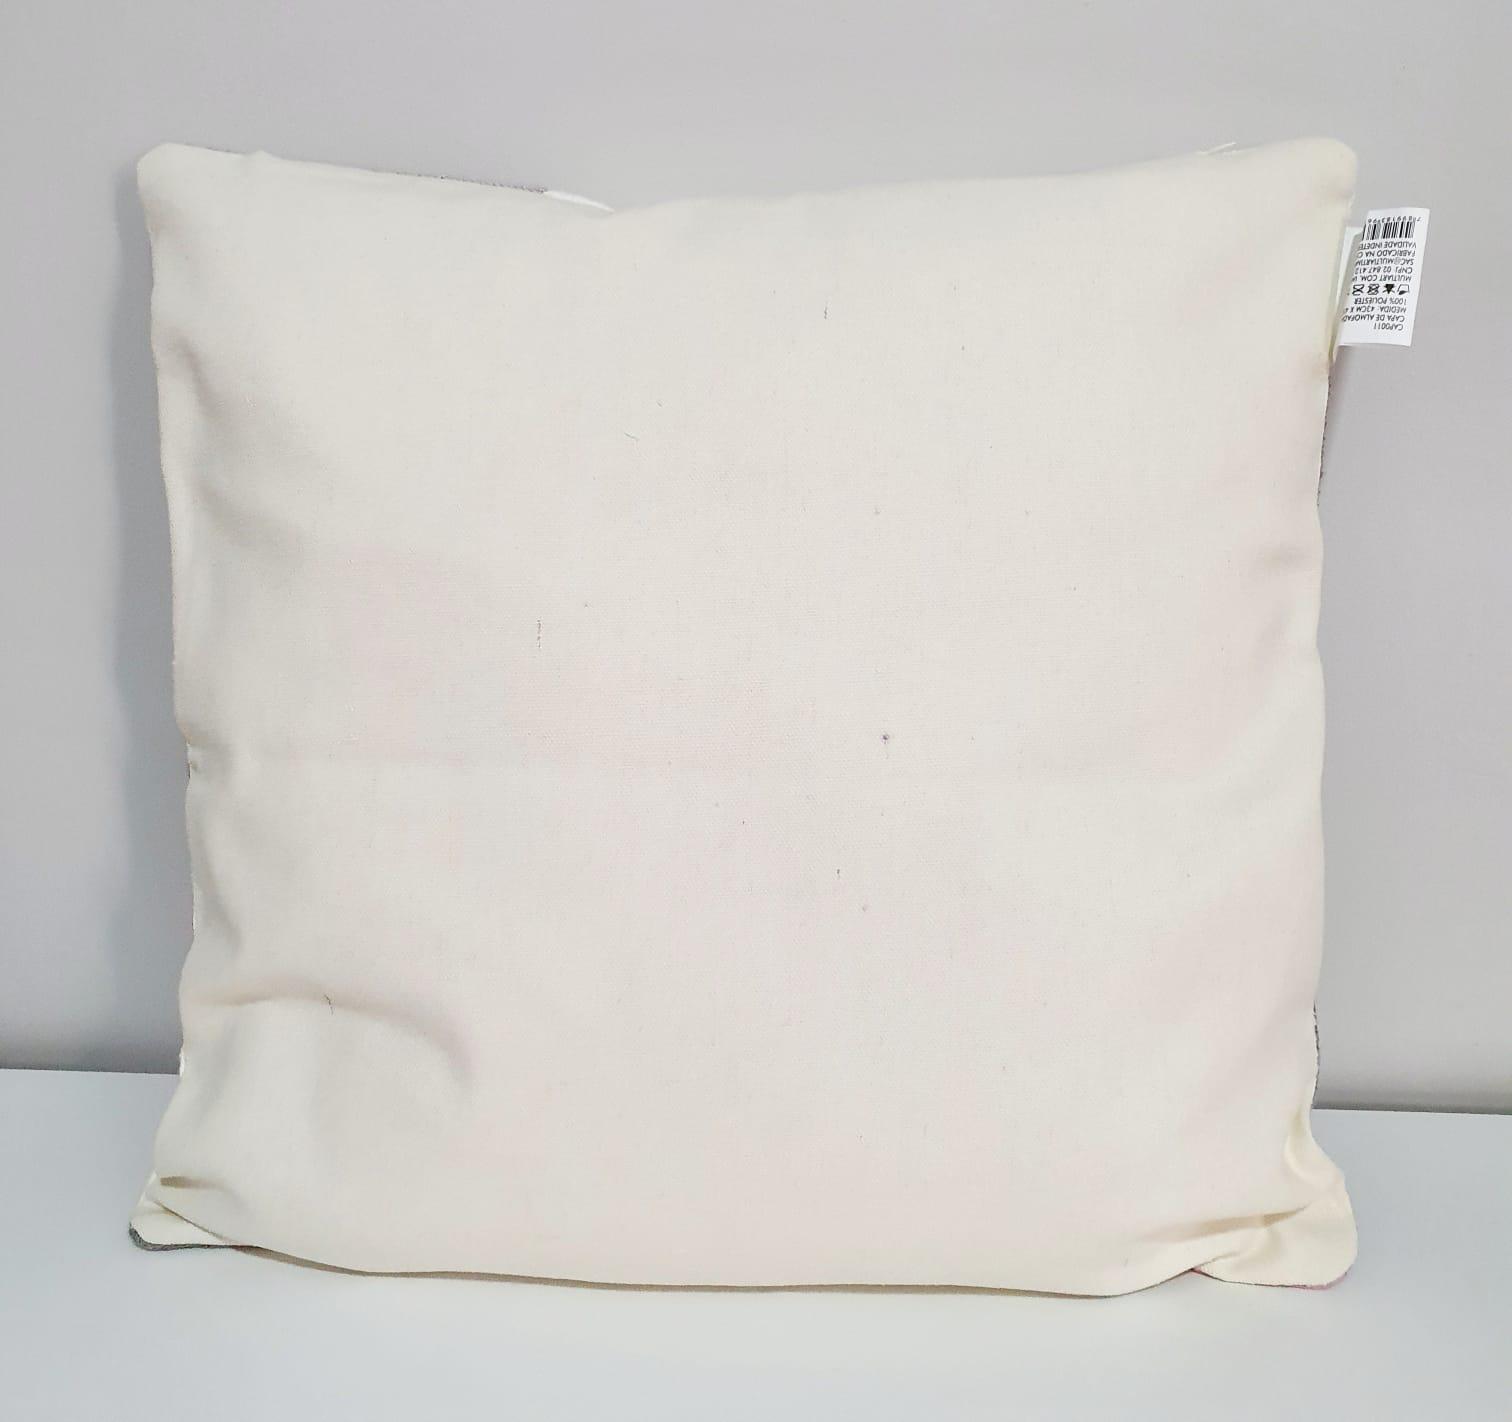 Capa para almofada - Tricô macramê 3 tons